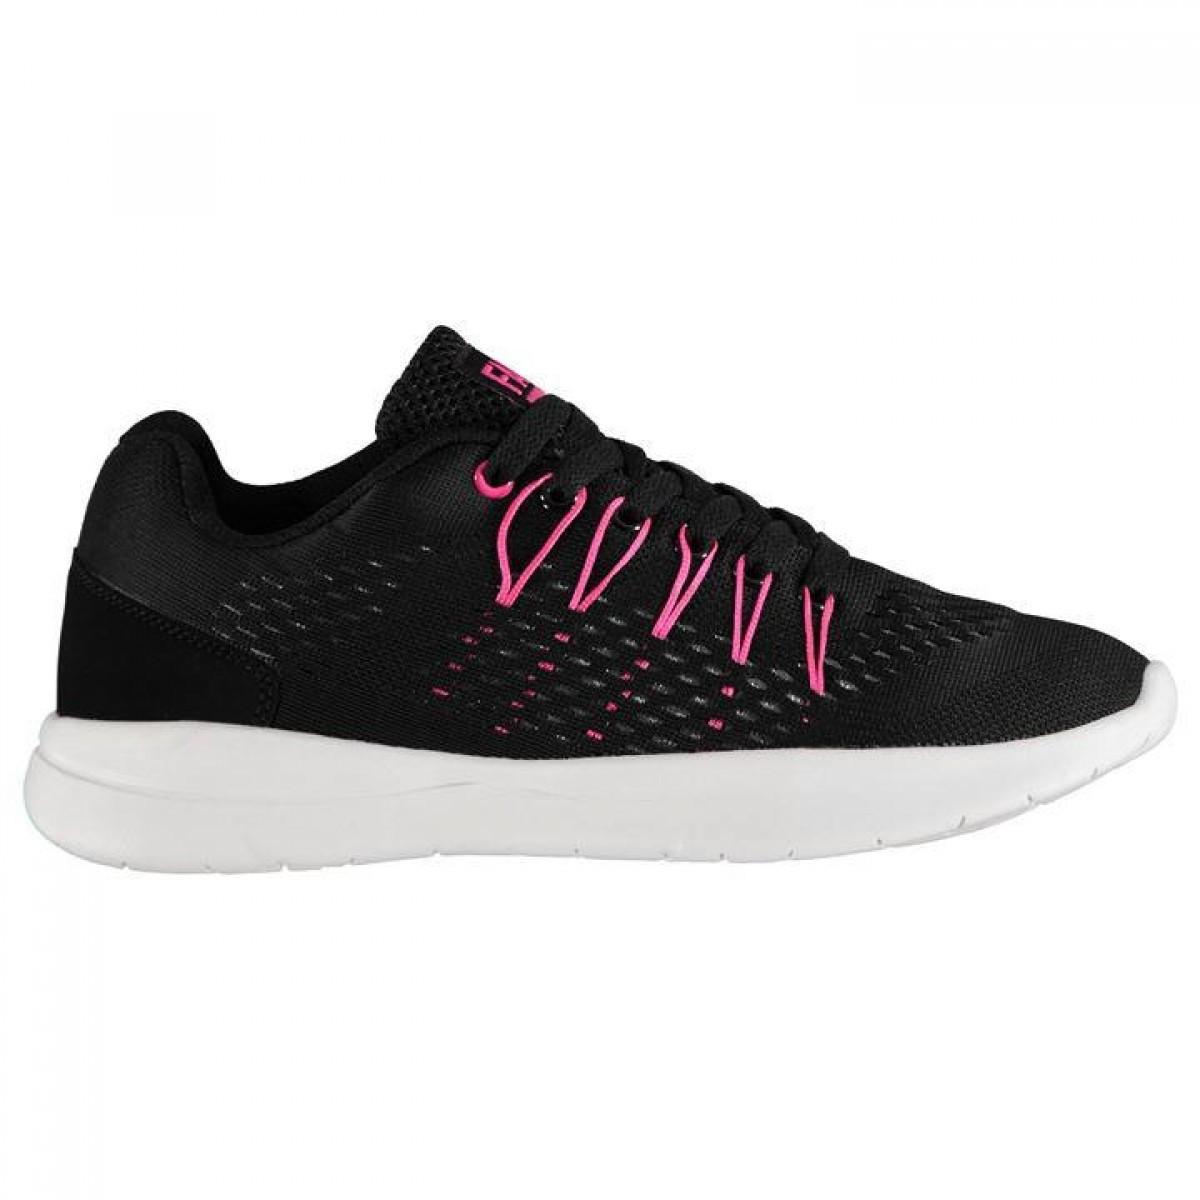 Кроссовки Fabric Montare Knit Black/Pink/Wht - Оригинал, фото 1